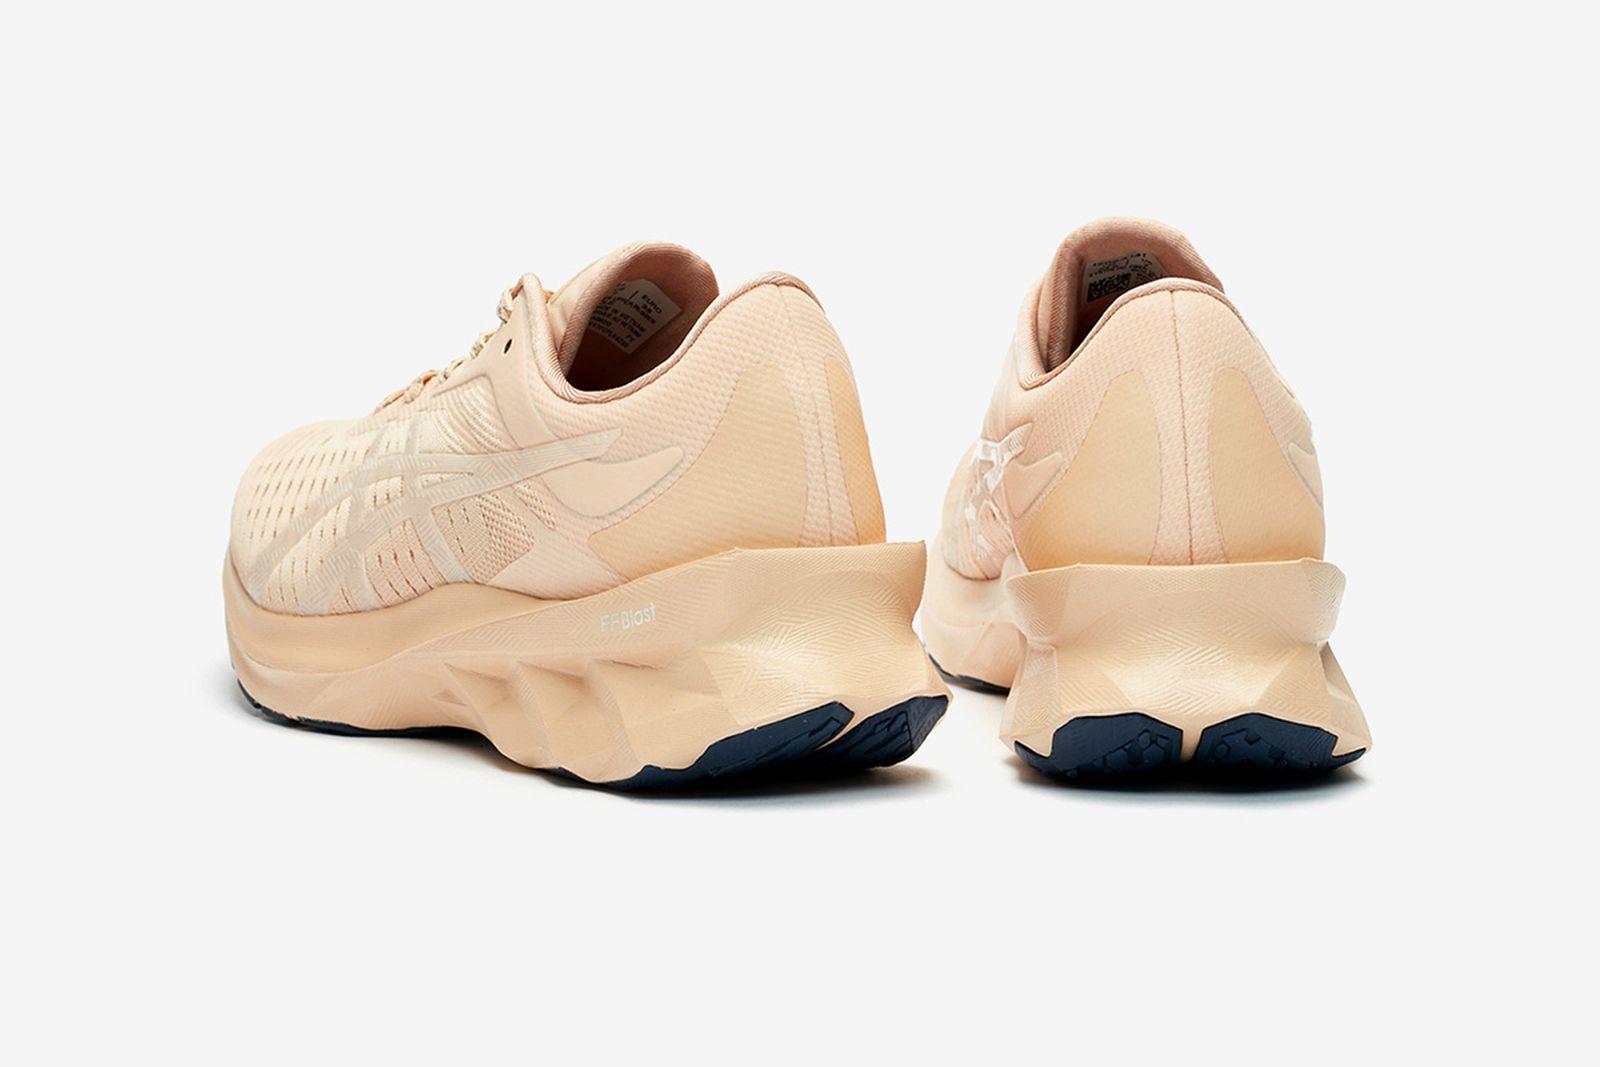 sneakersnstuff-asics-novablast-release-date-price-04